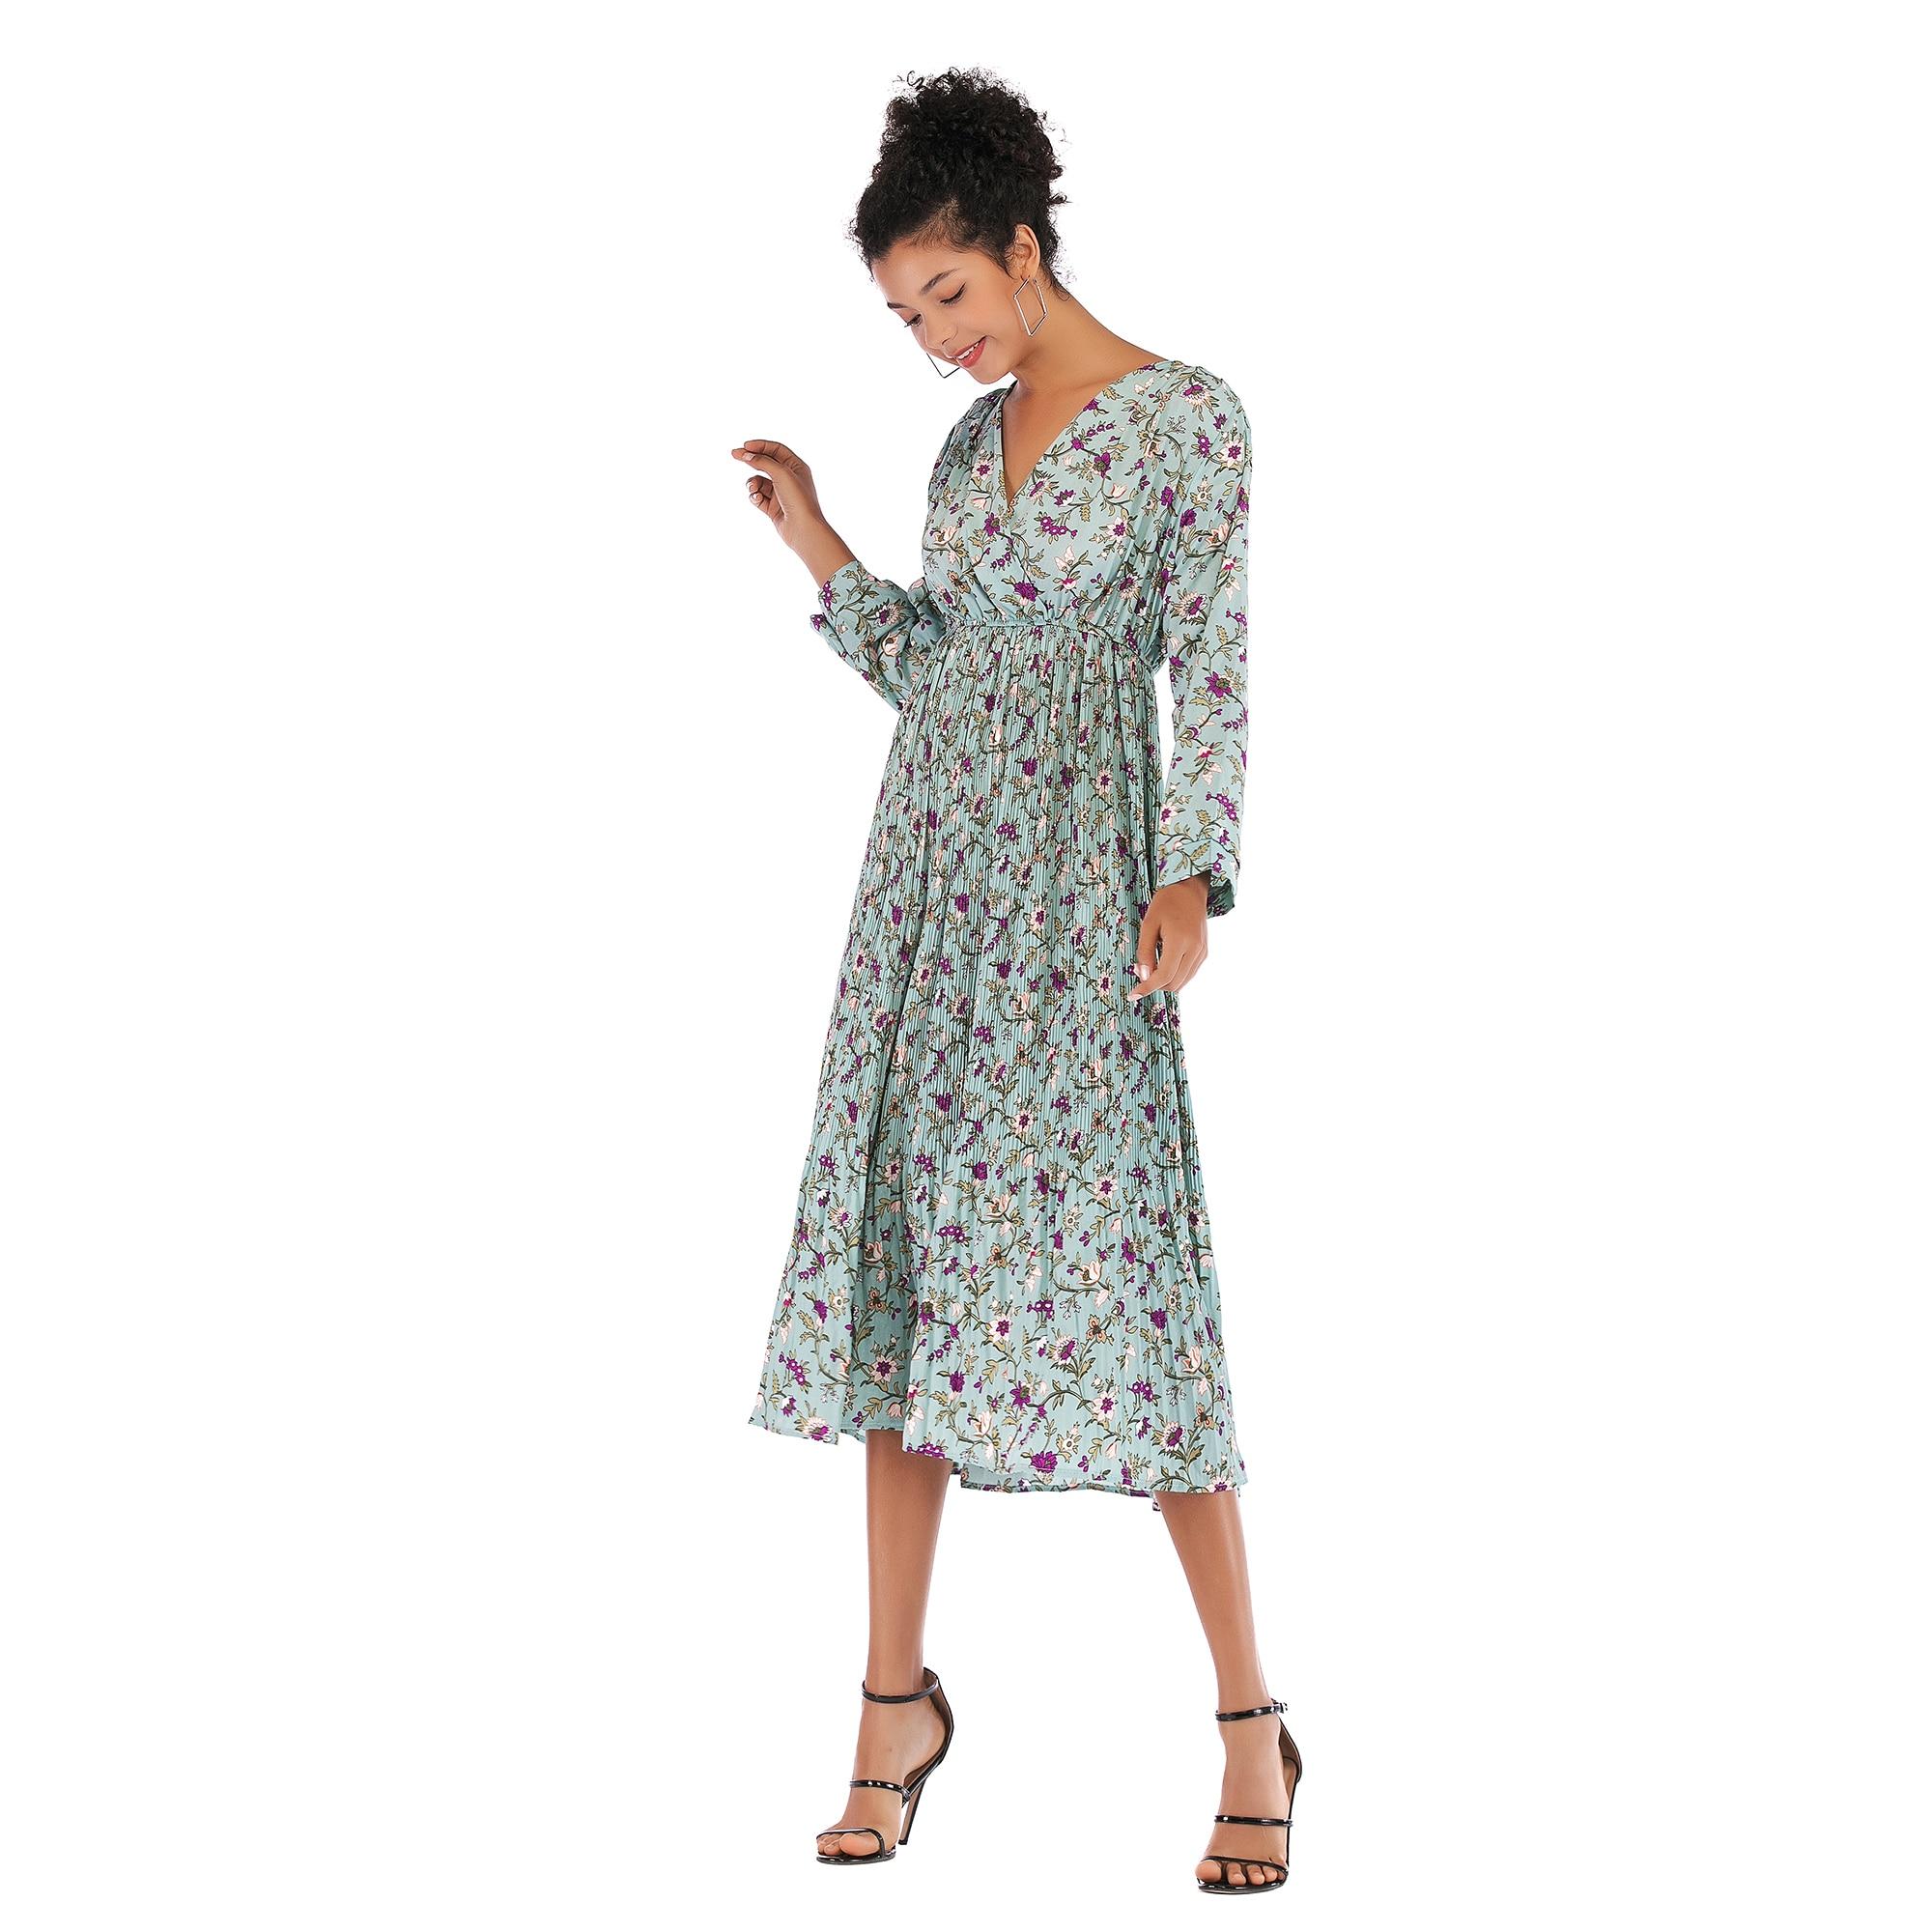 VZFF Women Summer Multicolor Small Floral Chiffon  Maxi Dress V neck Long Sleeved Shirred High Waist Hem 2019 Spring Dresses